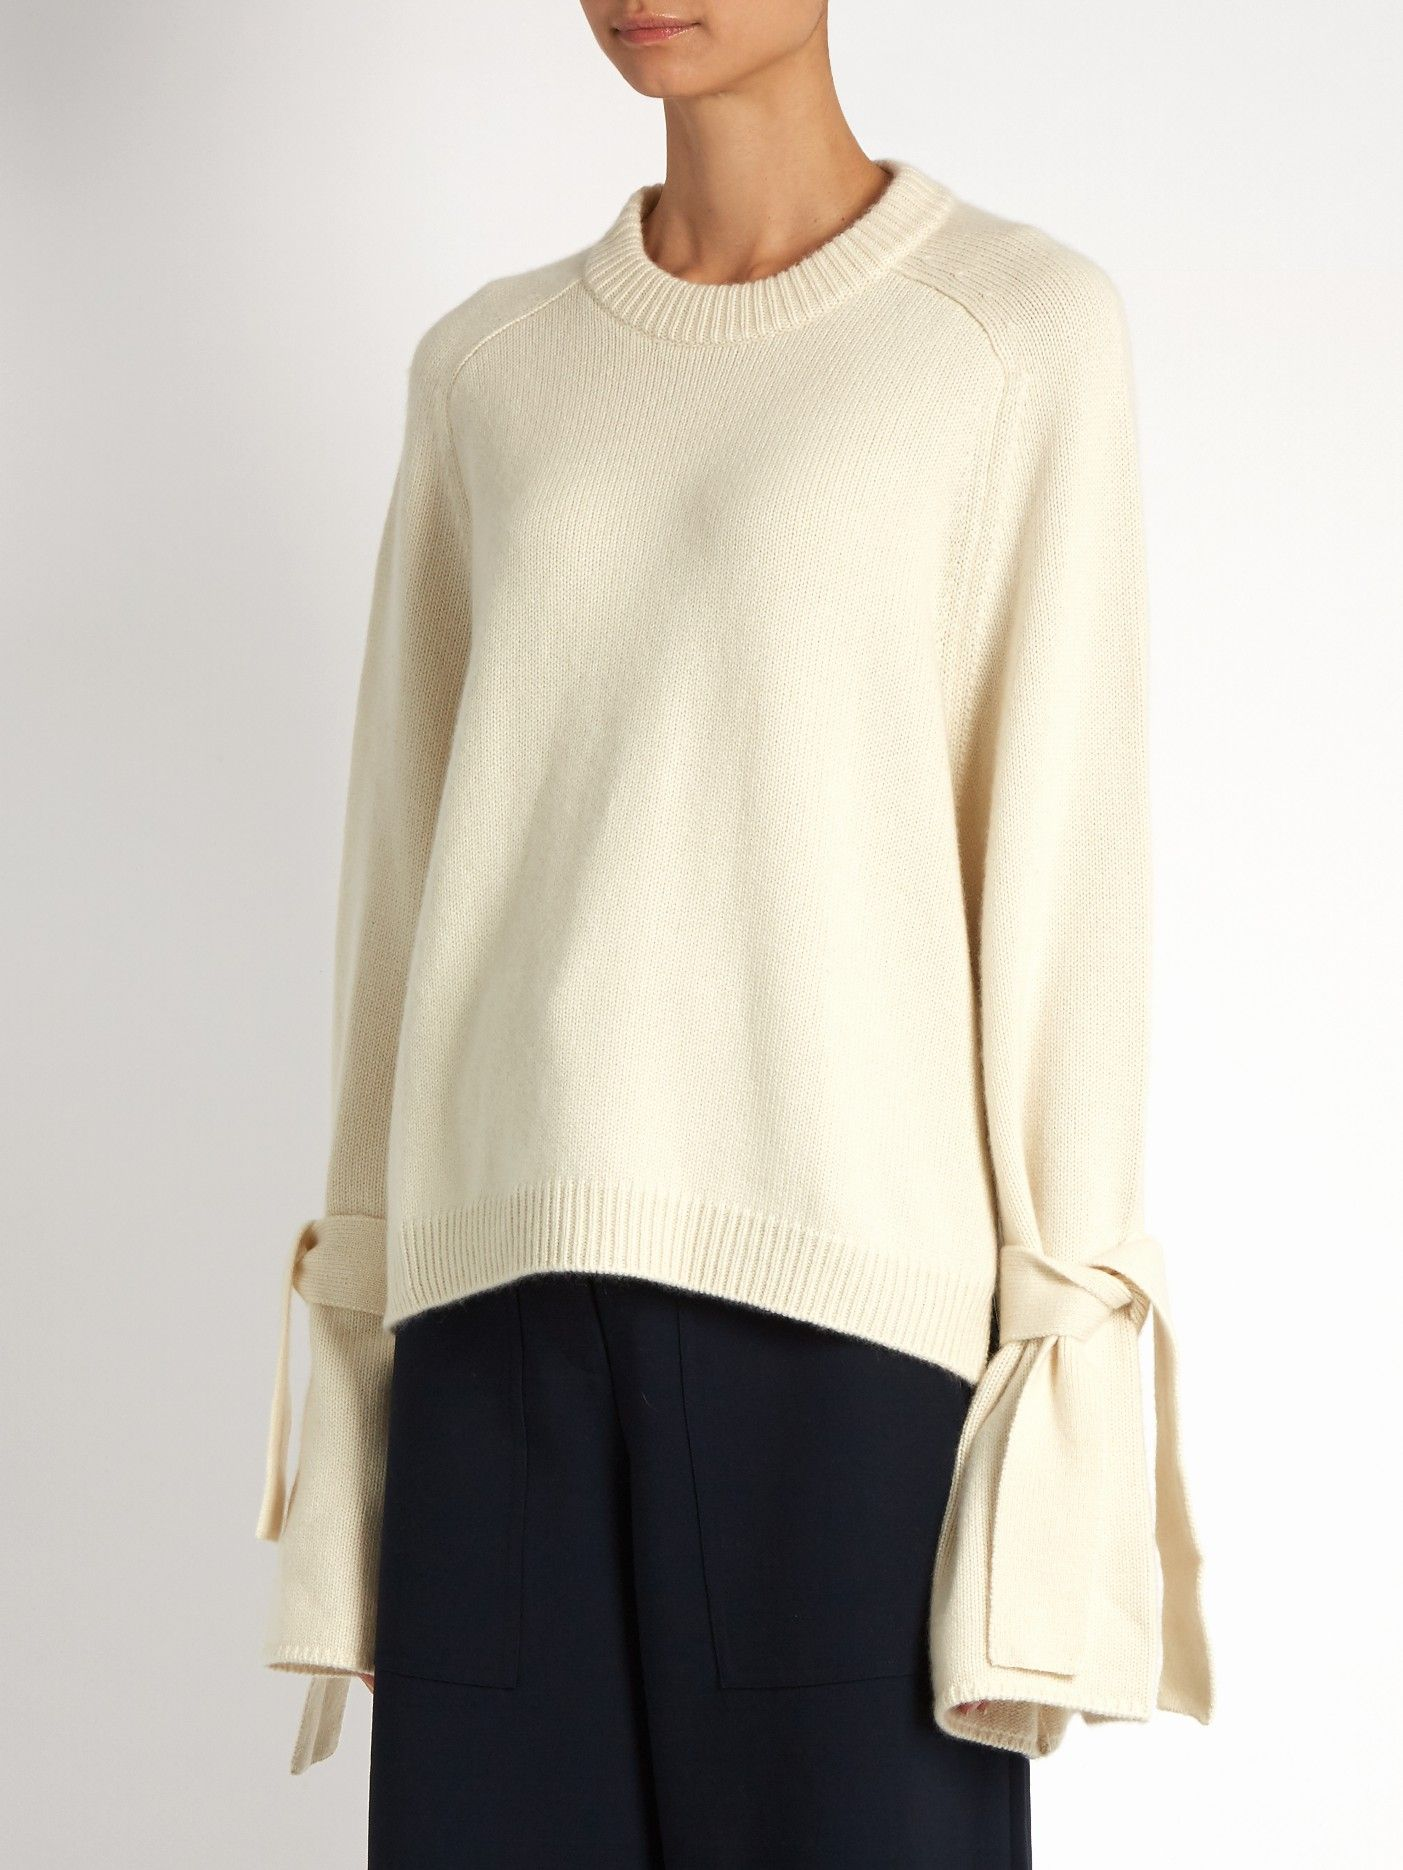 Tie-sleeve cashmere sweater   Tibi   MATCHESFASHION.COM   Shopping ...